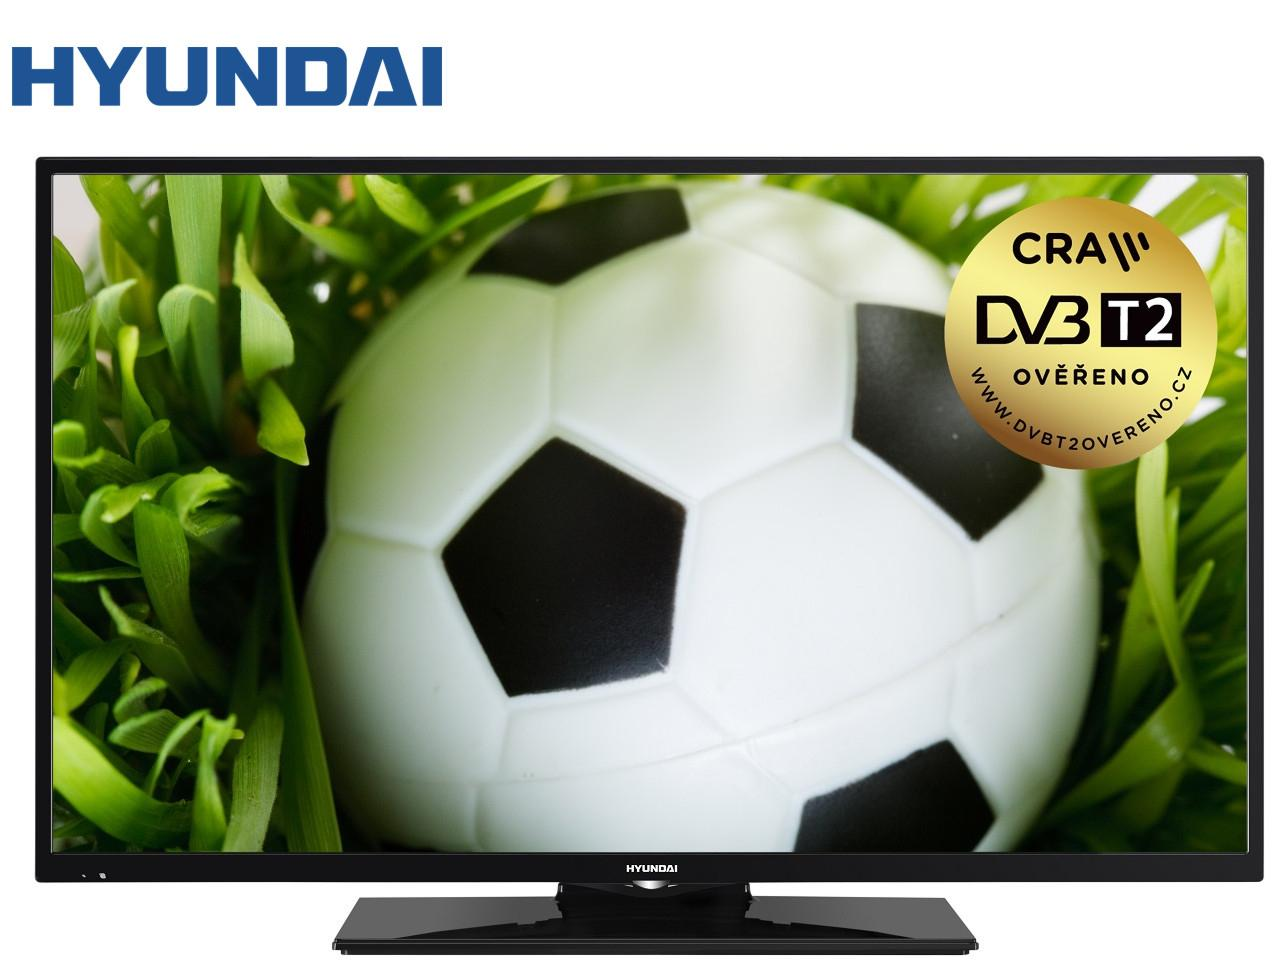 HYUNDAI FLP 32T339, CZ distribuce